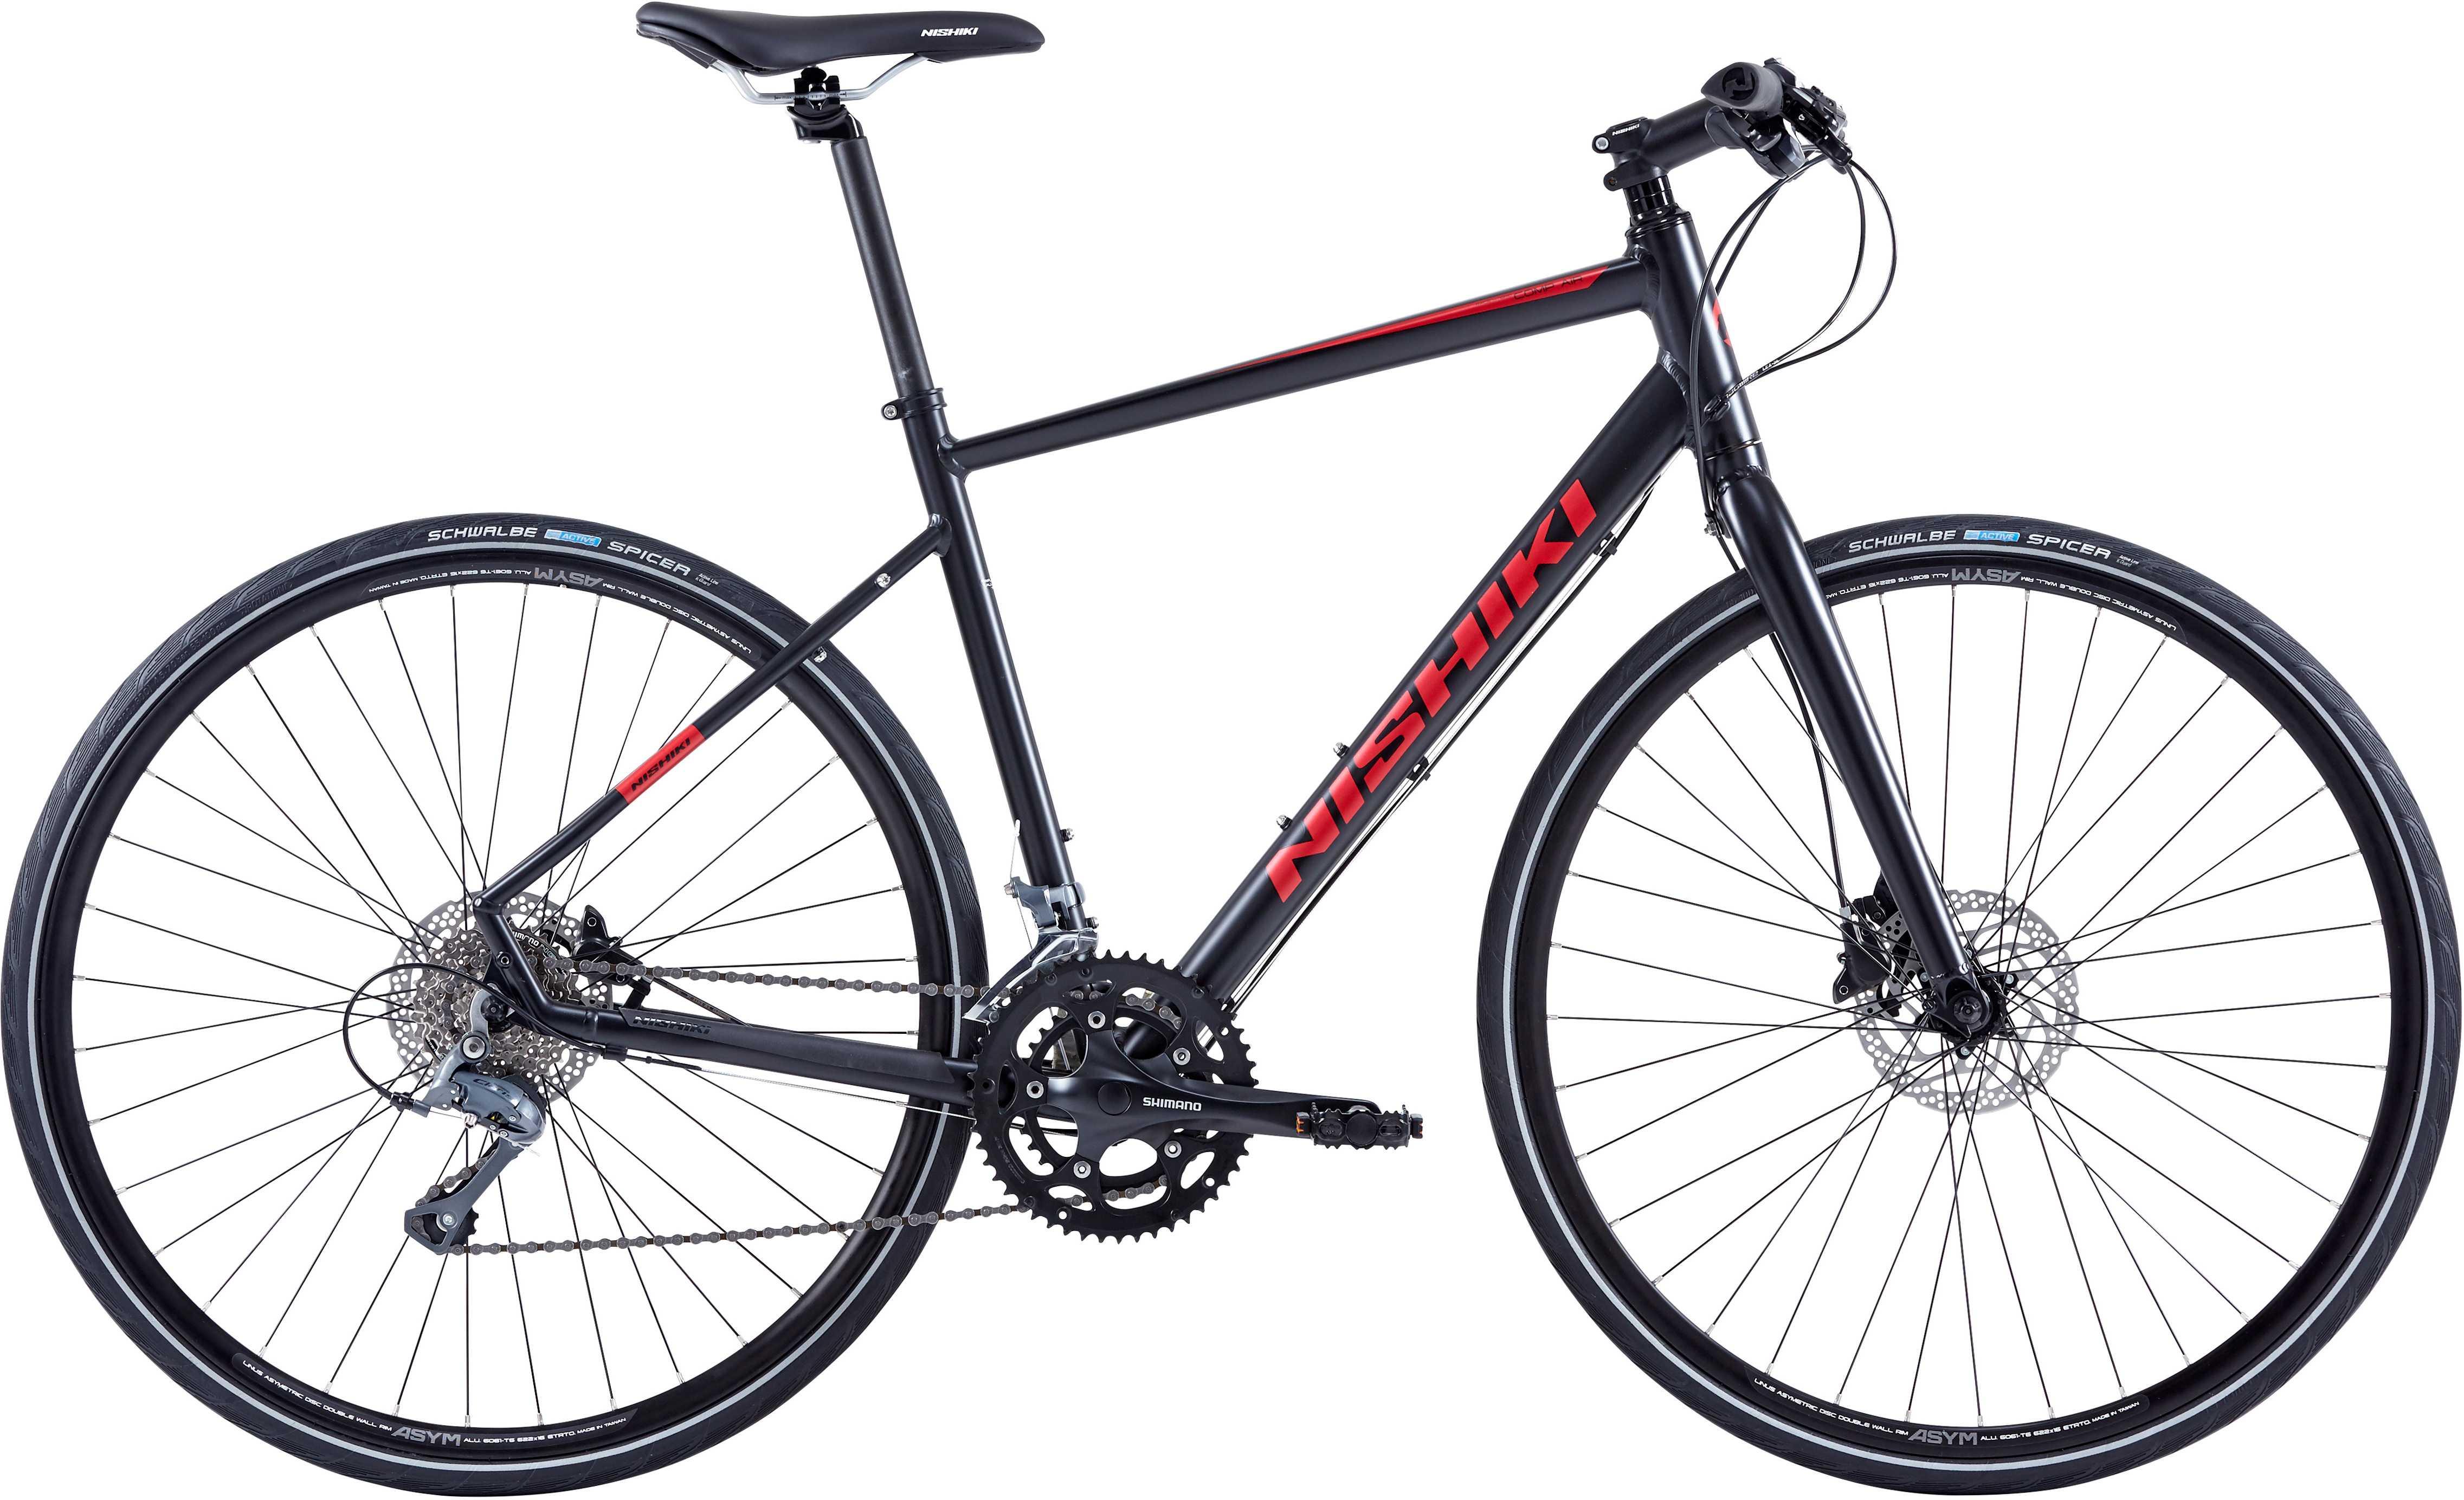 NISHIKI COMP-AIR HERRE SORT/R | City-cykler